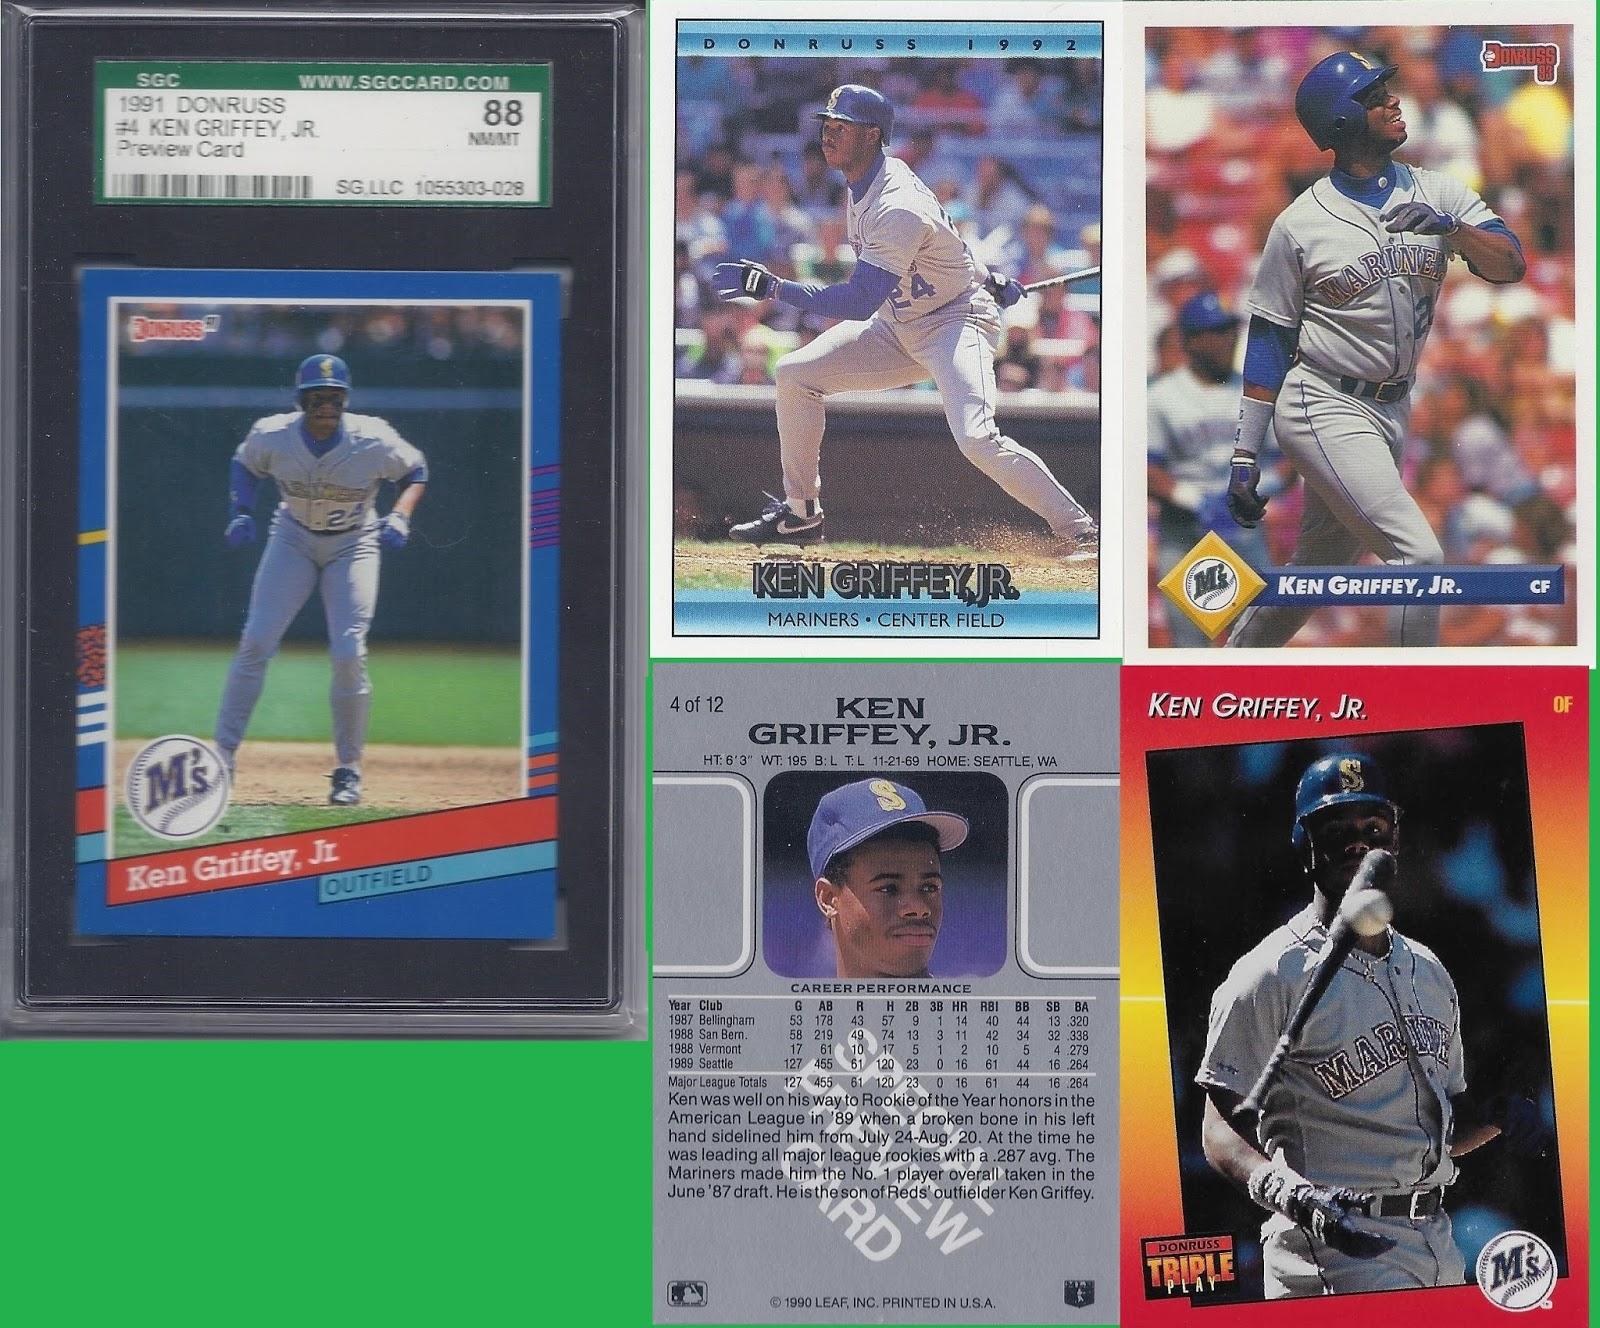 21ffdca592 Donruss/Leaf/Triple Play Previews (1990 Leaf, 1991, 1992, 1993 Donruss,  1992 Triple Play)